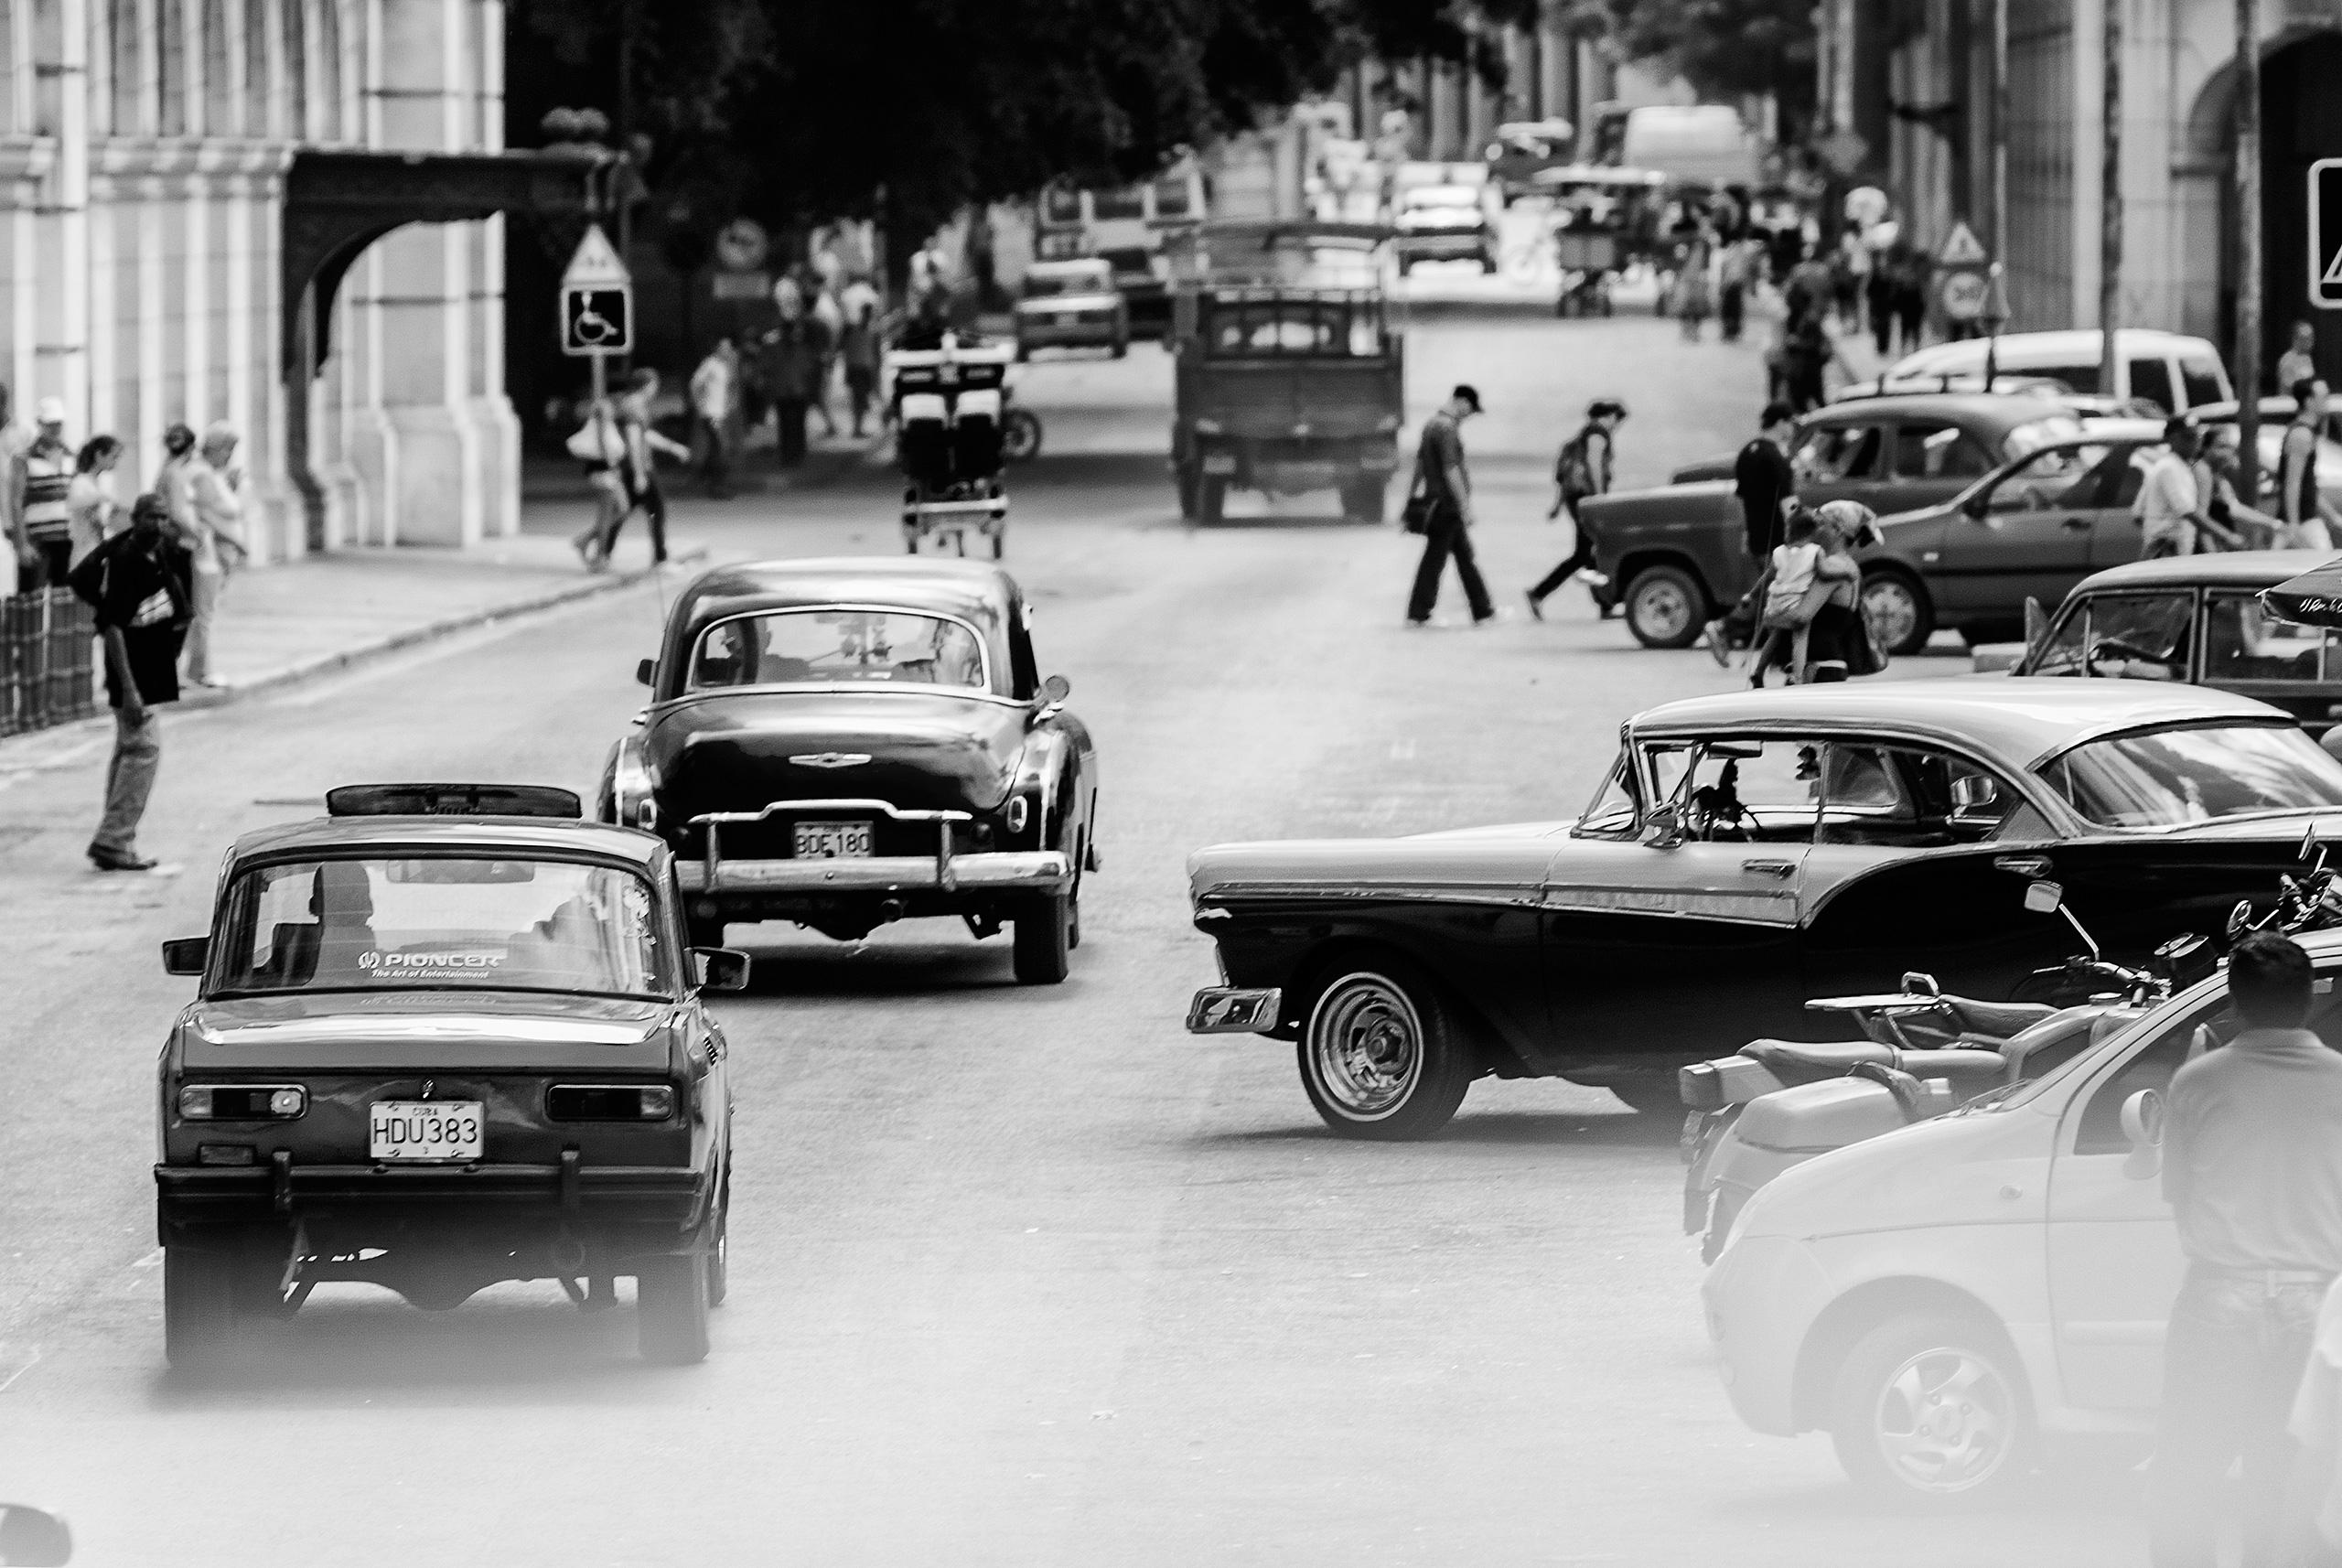 ready mission - Habana, Cuba - christofkessemeier | ello